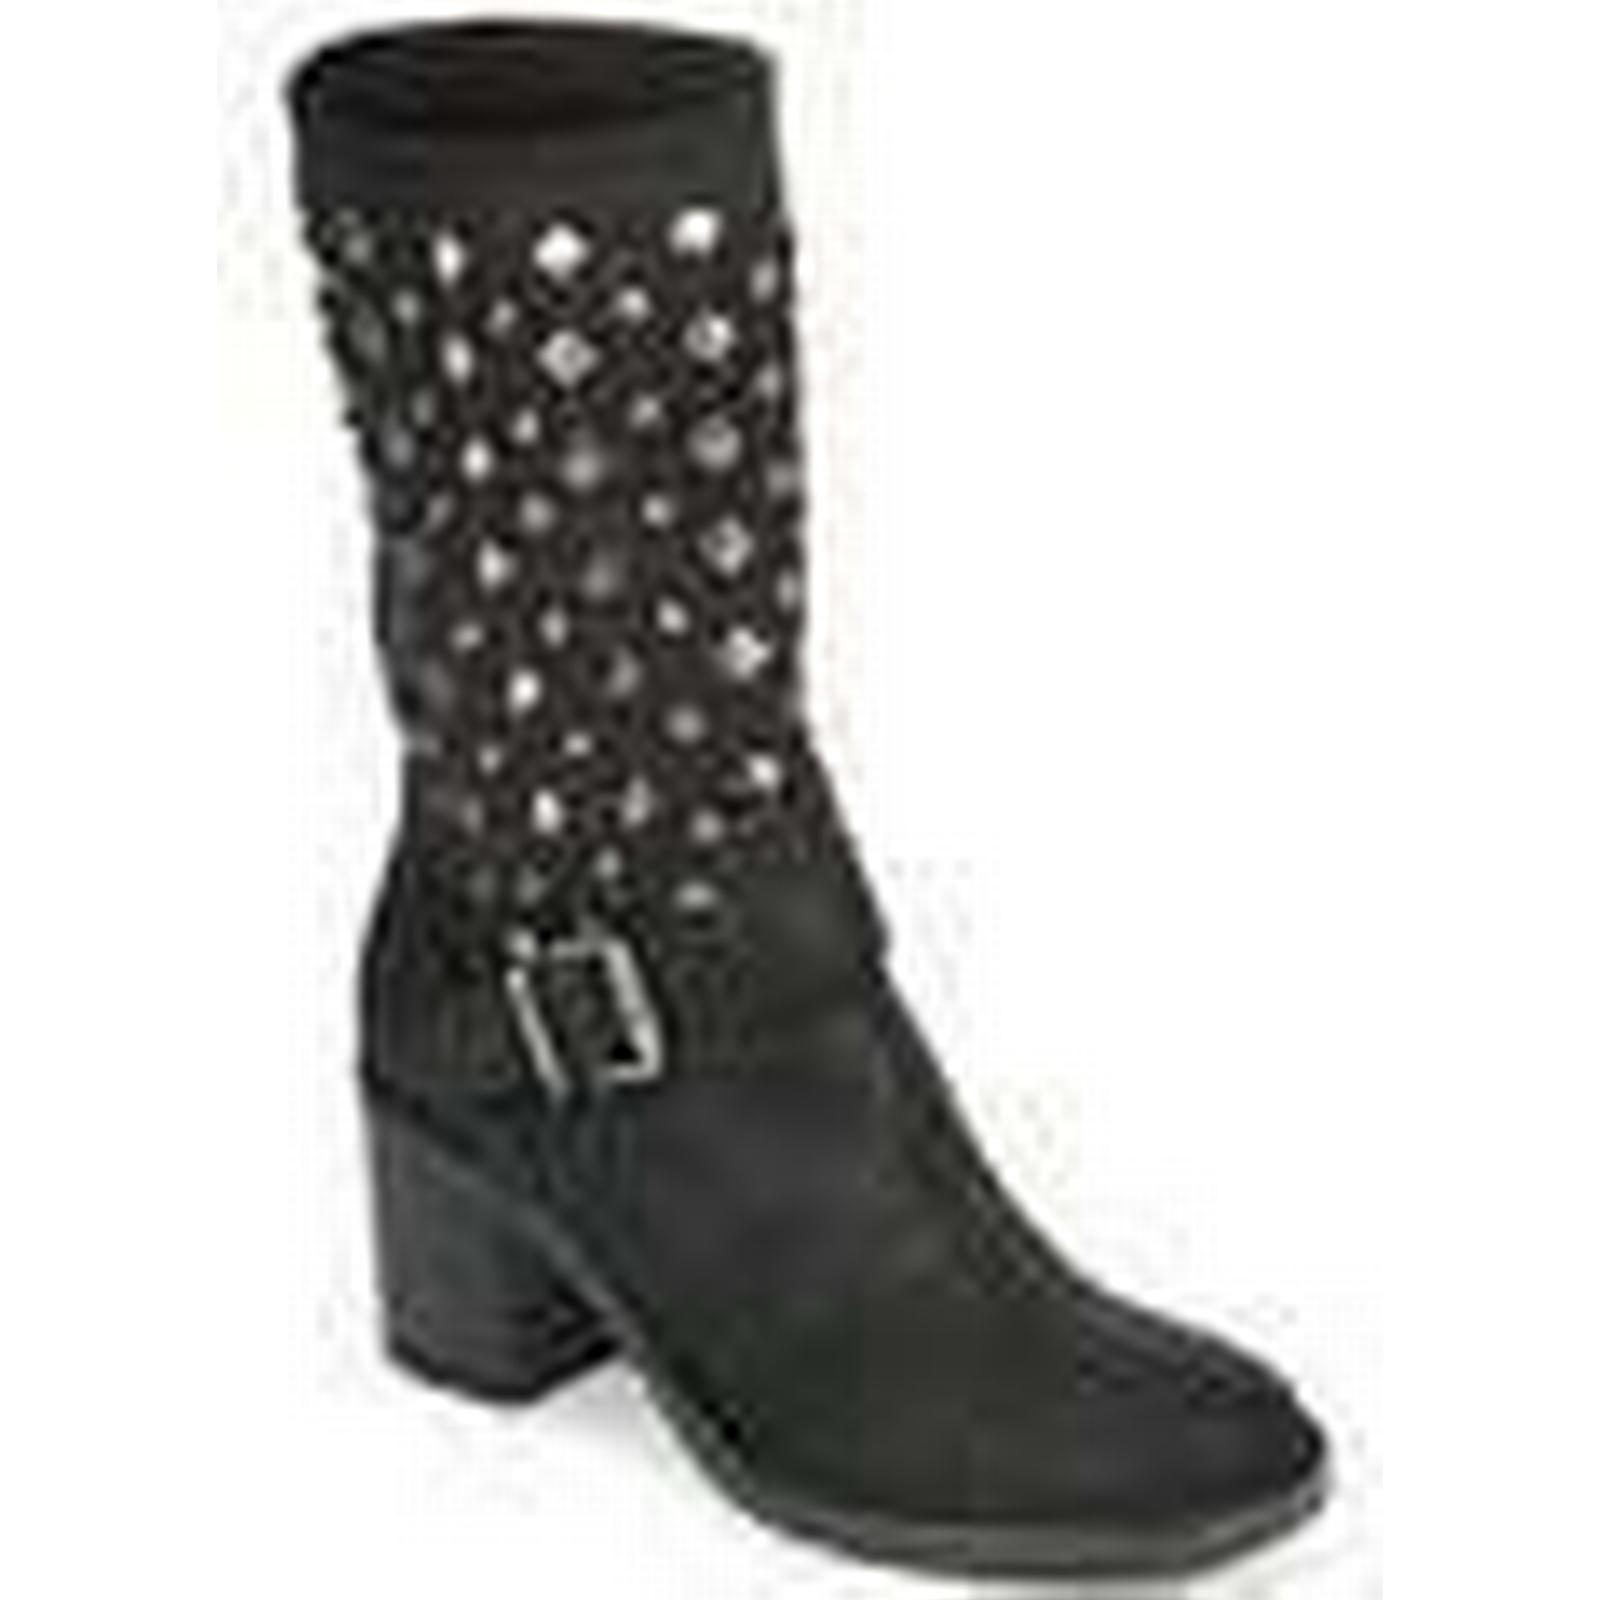 Meline  DOTRE  women's Black Low Ankle Boots in Black women's d8abe4